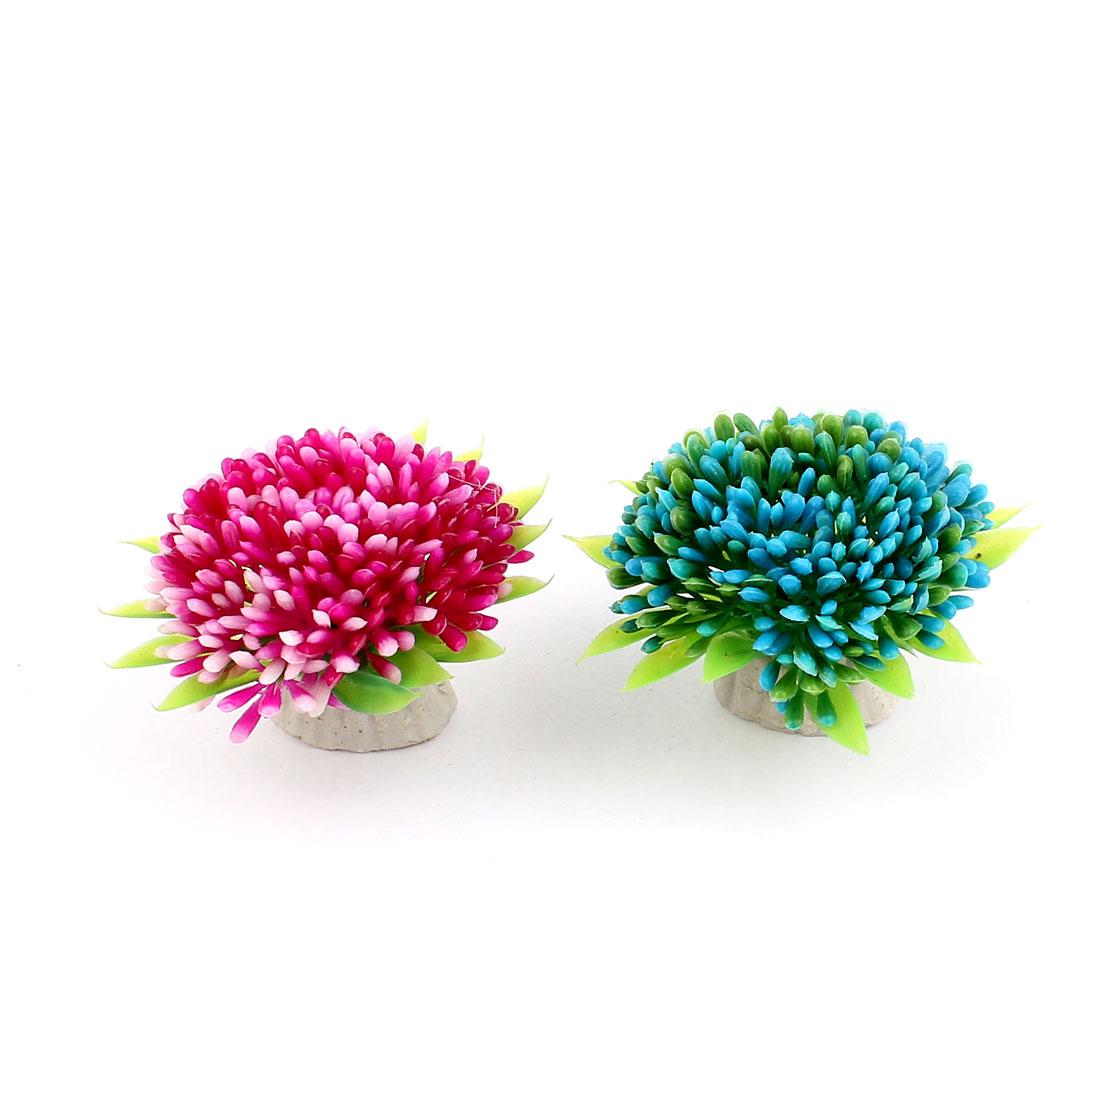 2pcs Blue Purple Plastic Artificial Aquarium Flower Underwater Plant Ornament for Fishbowl Fish Tank